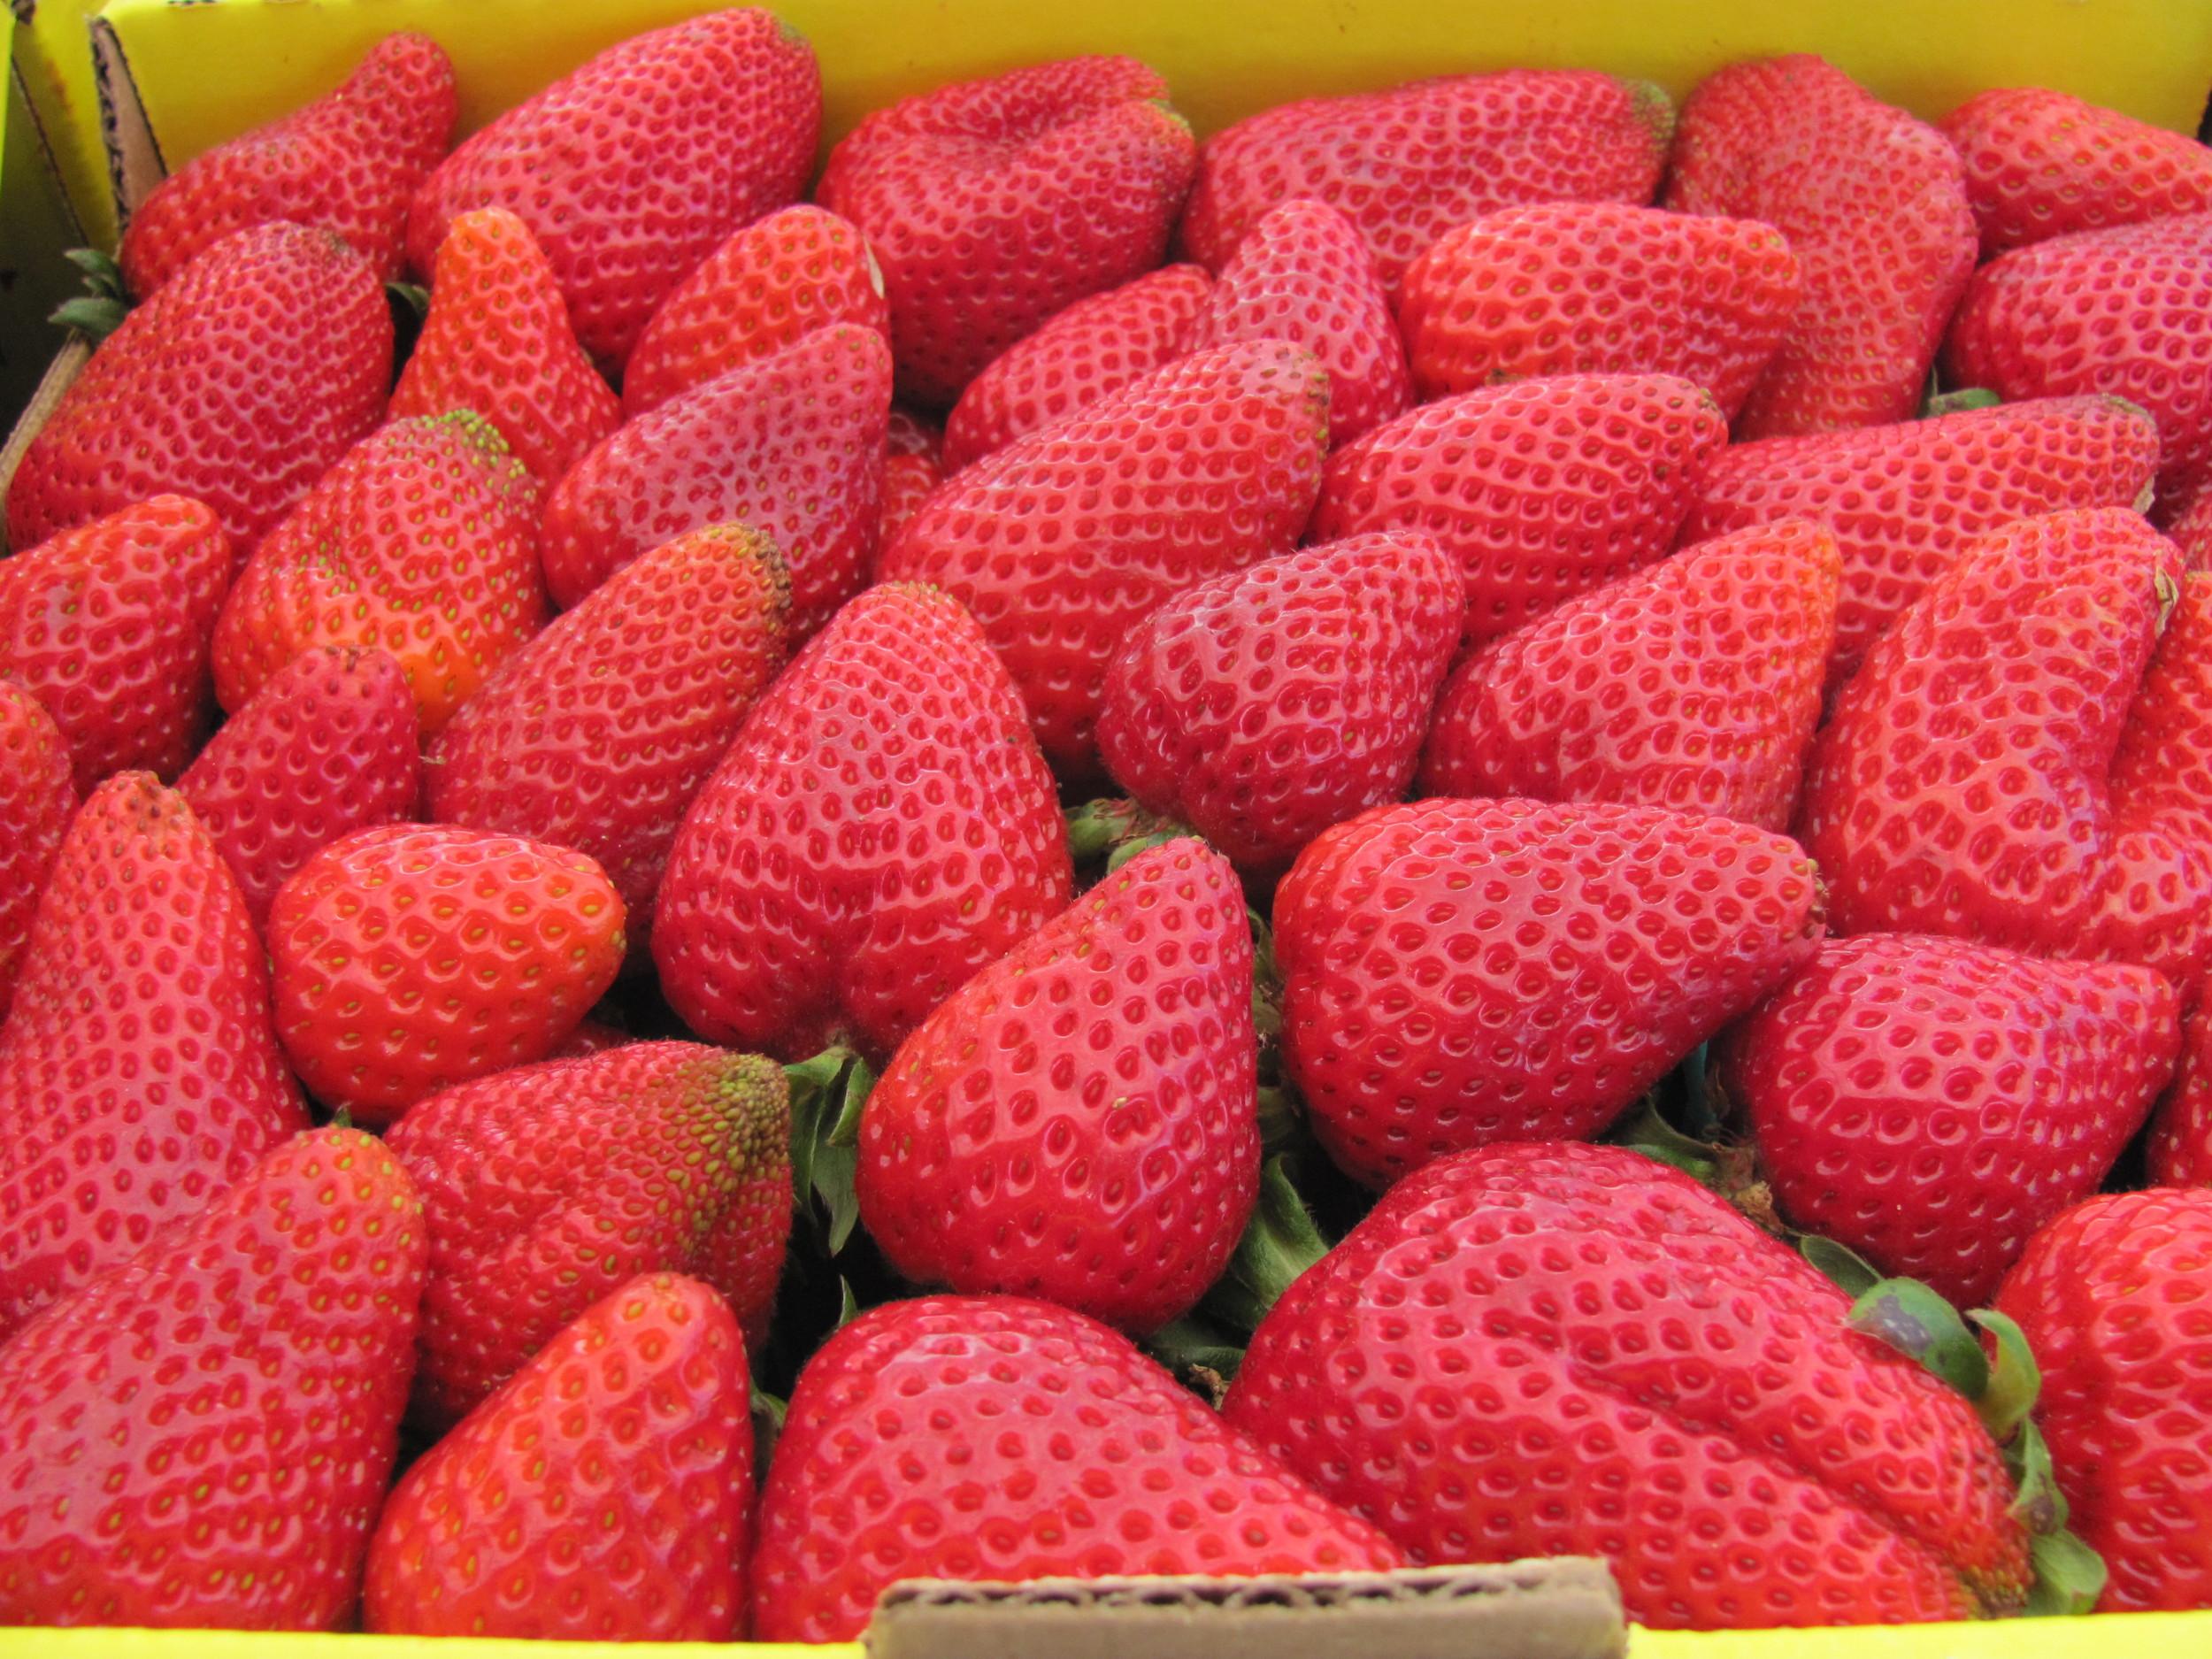 Rossmoor Farmers' Market Strawberries